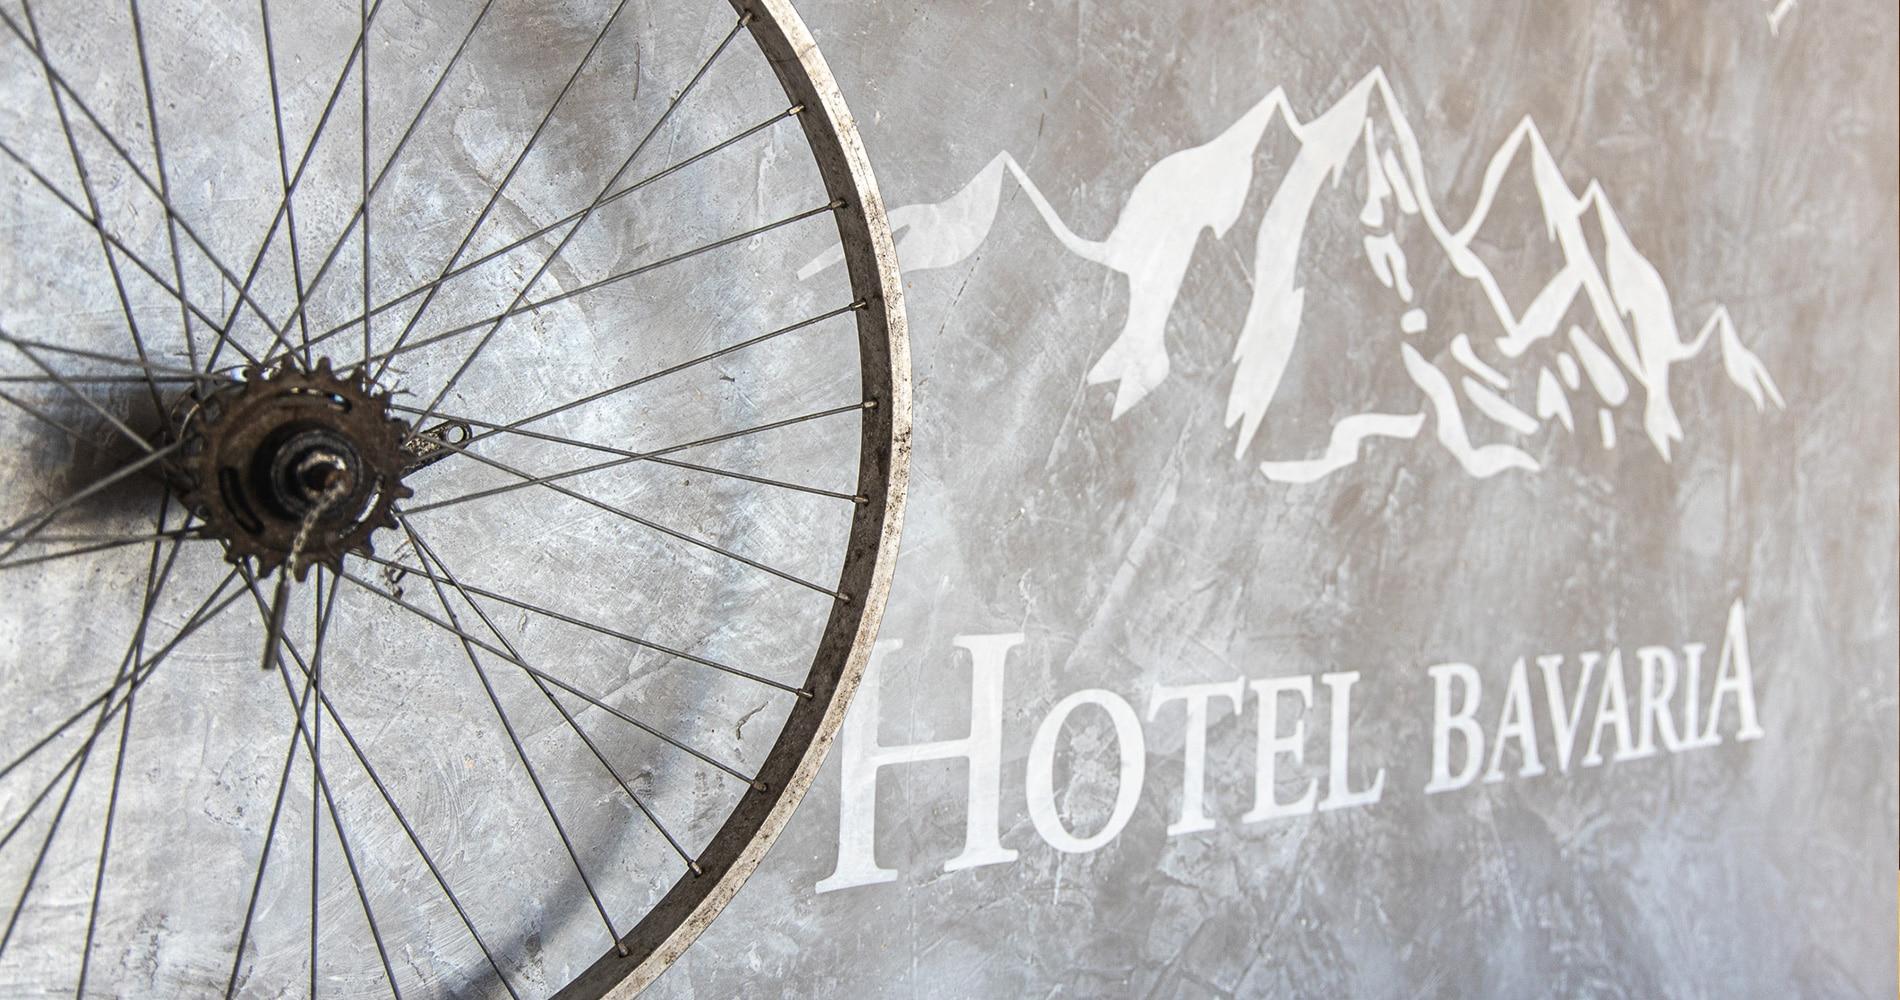 hotel bavaria fahrrad-hotel